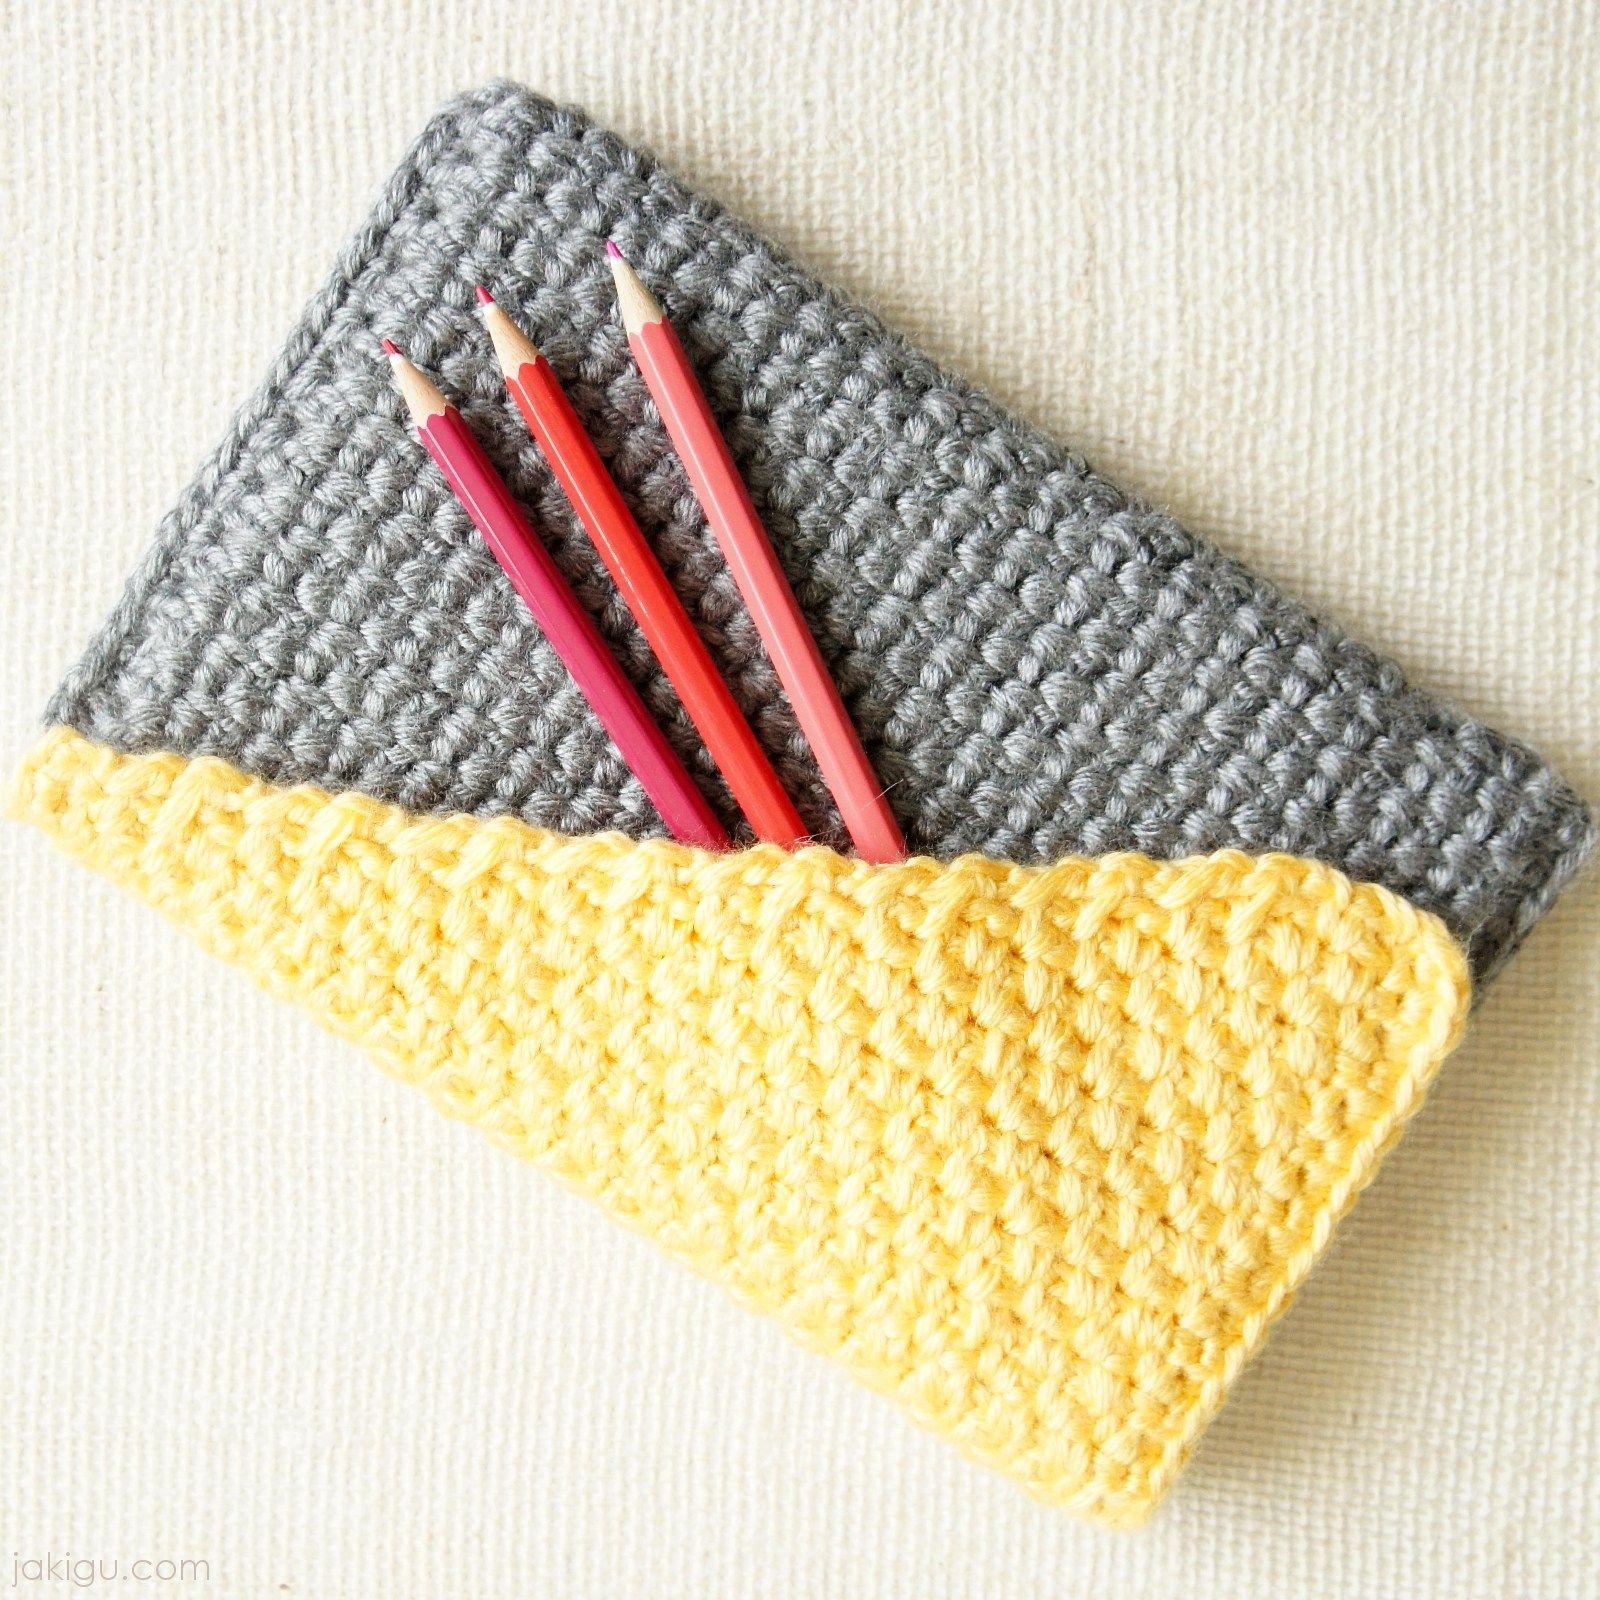 Crochet Clutch With Color Block Flap Crochet Pattern Crochet Pencil Case Crochet Clutch Crochet Patterns